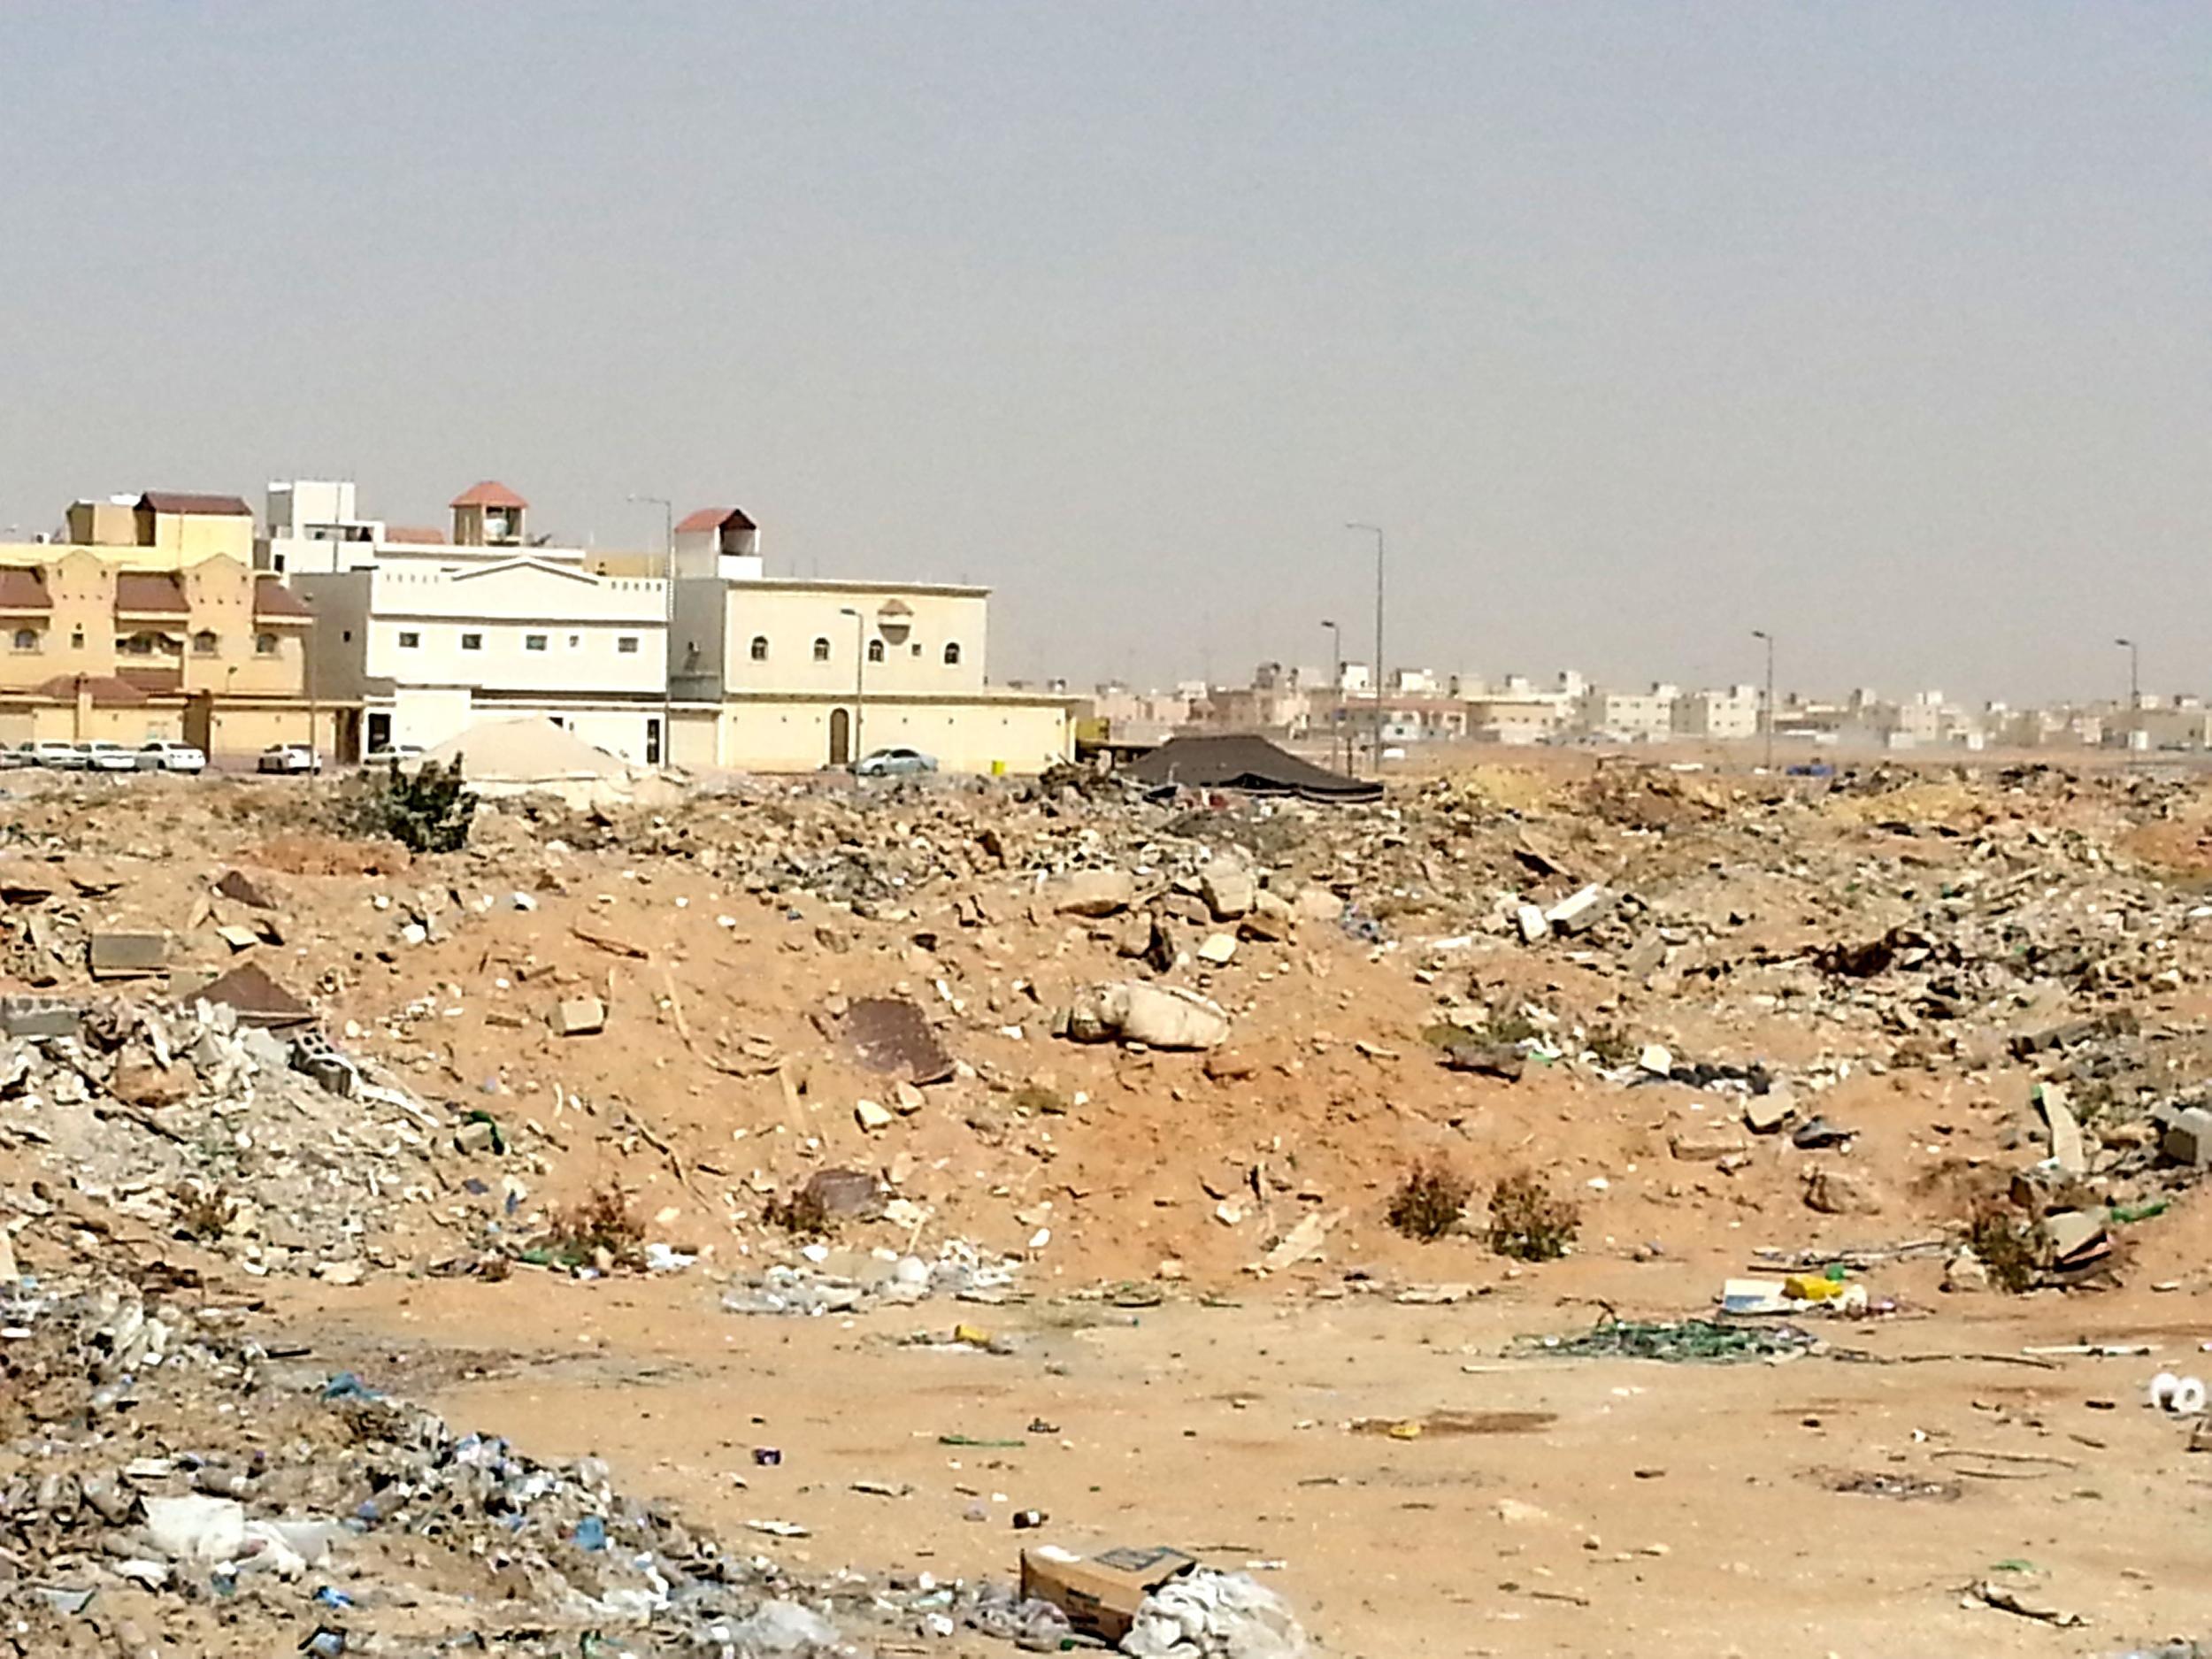 New housing area in Al Nazeem